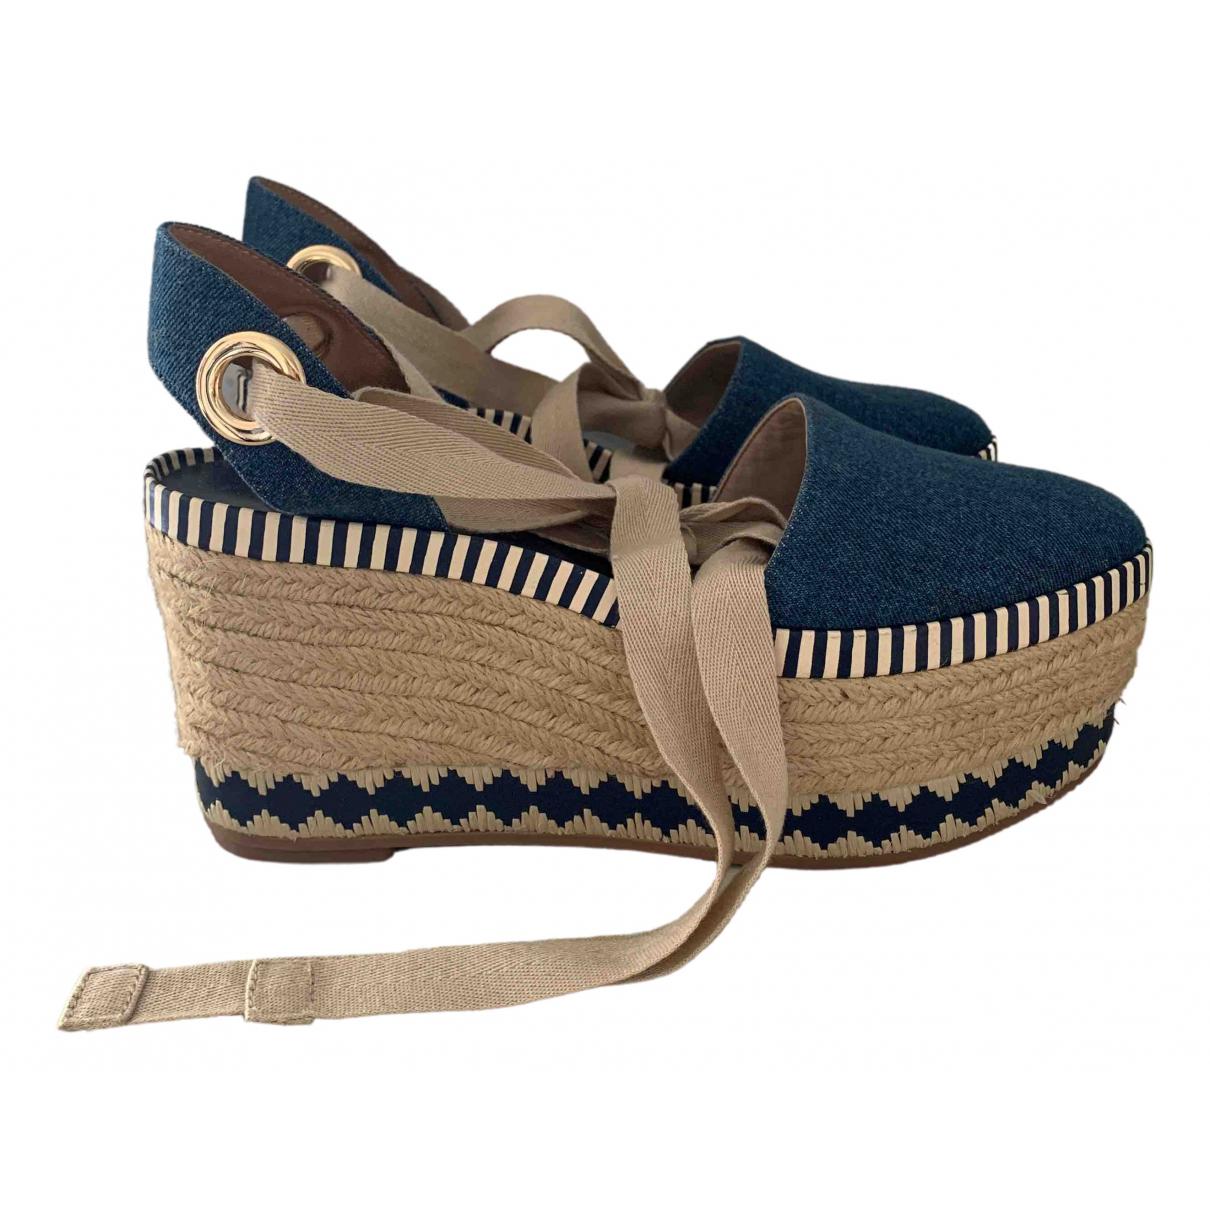 Tory Burch \N Blue Denim - Jeans Espadrilles for Women 8 US